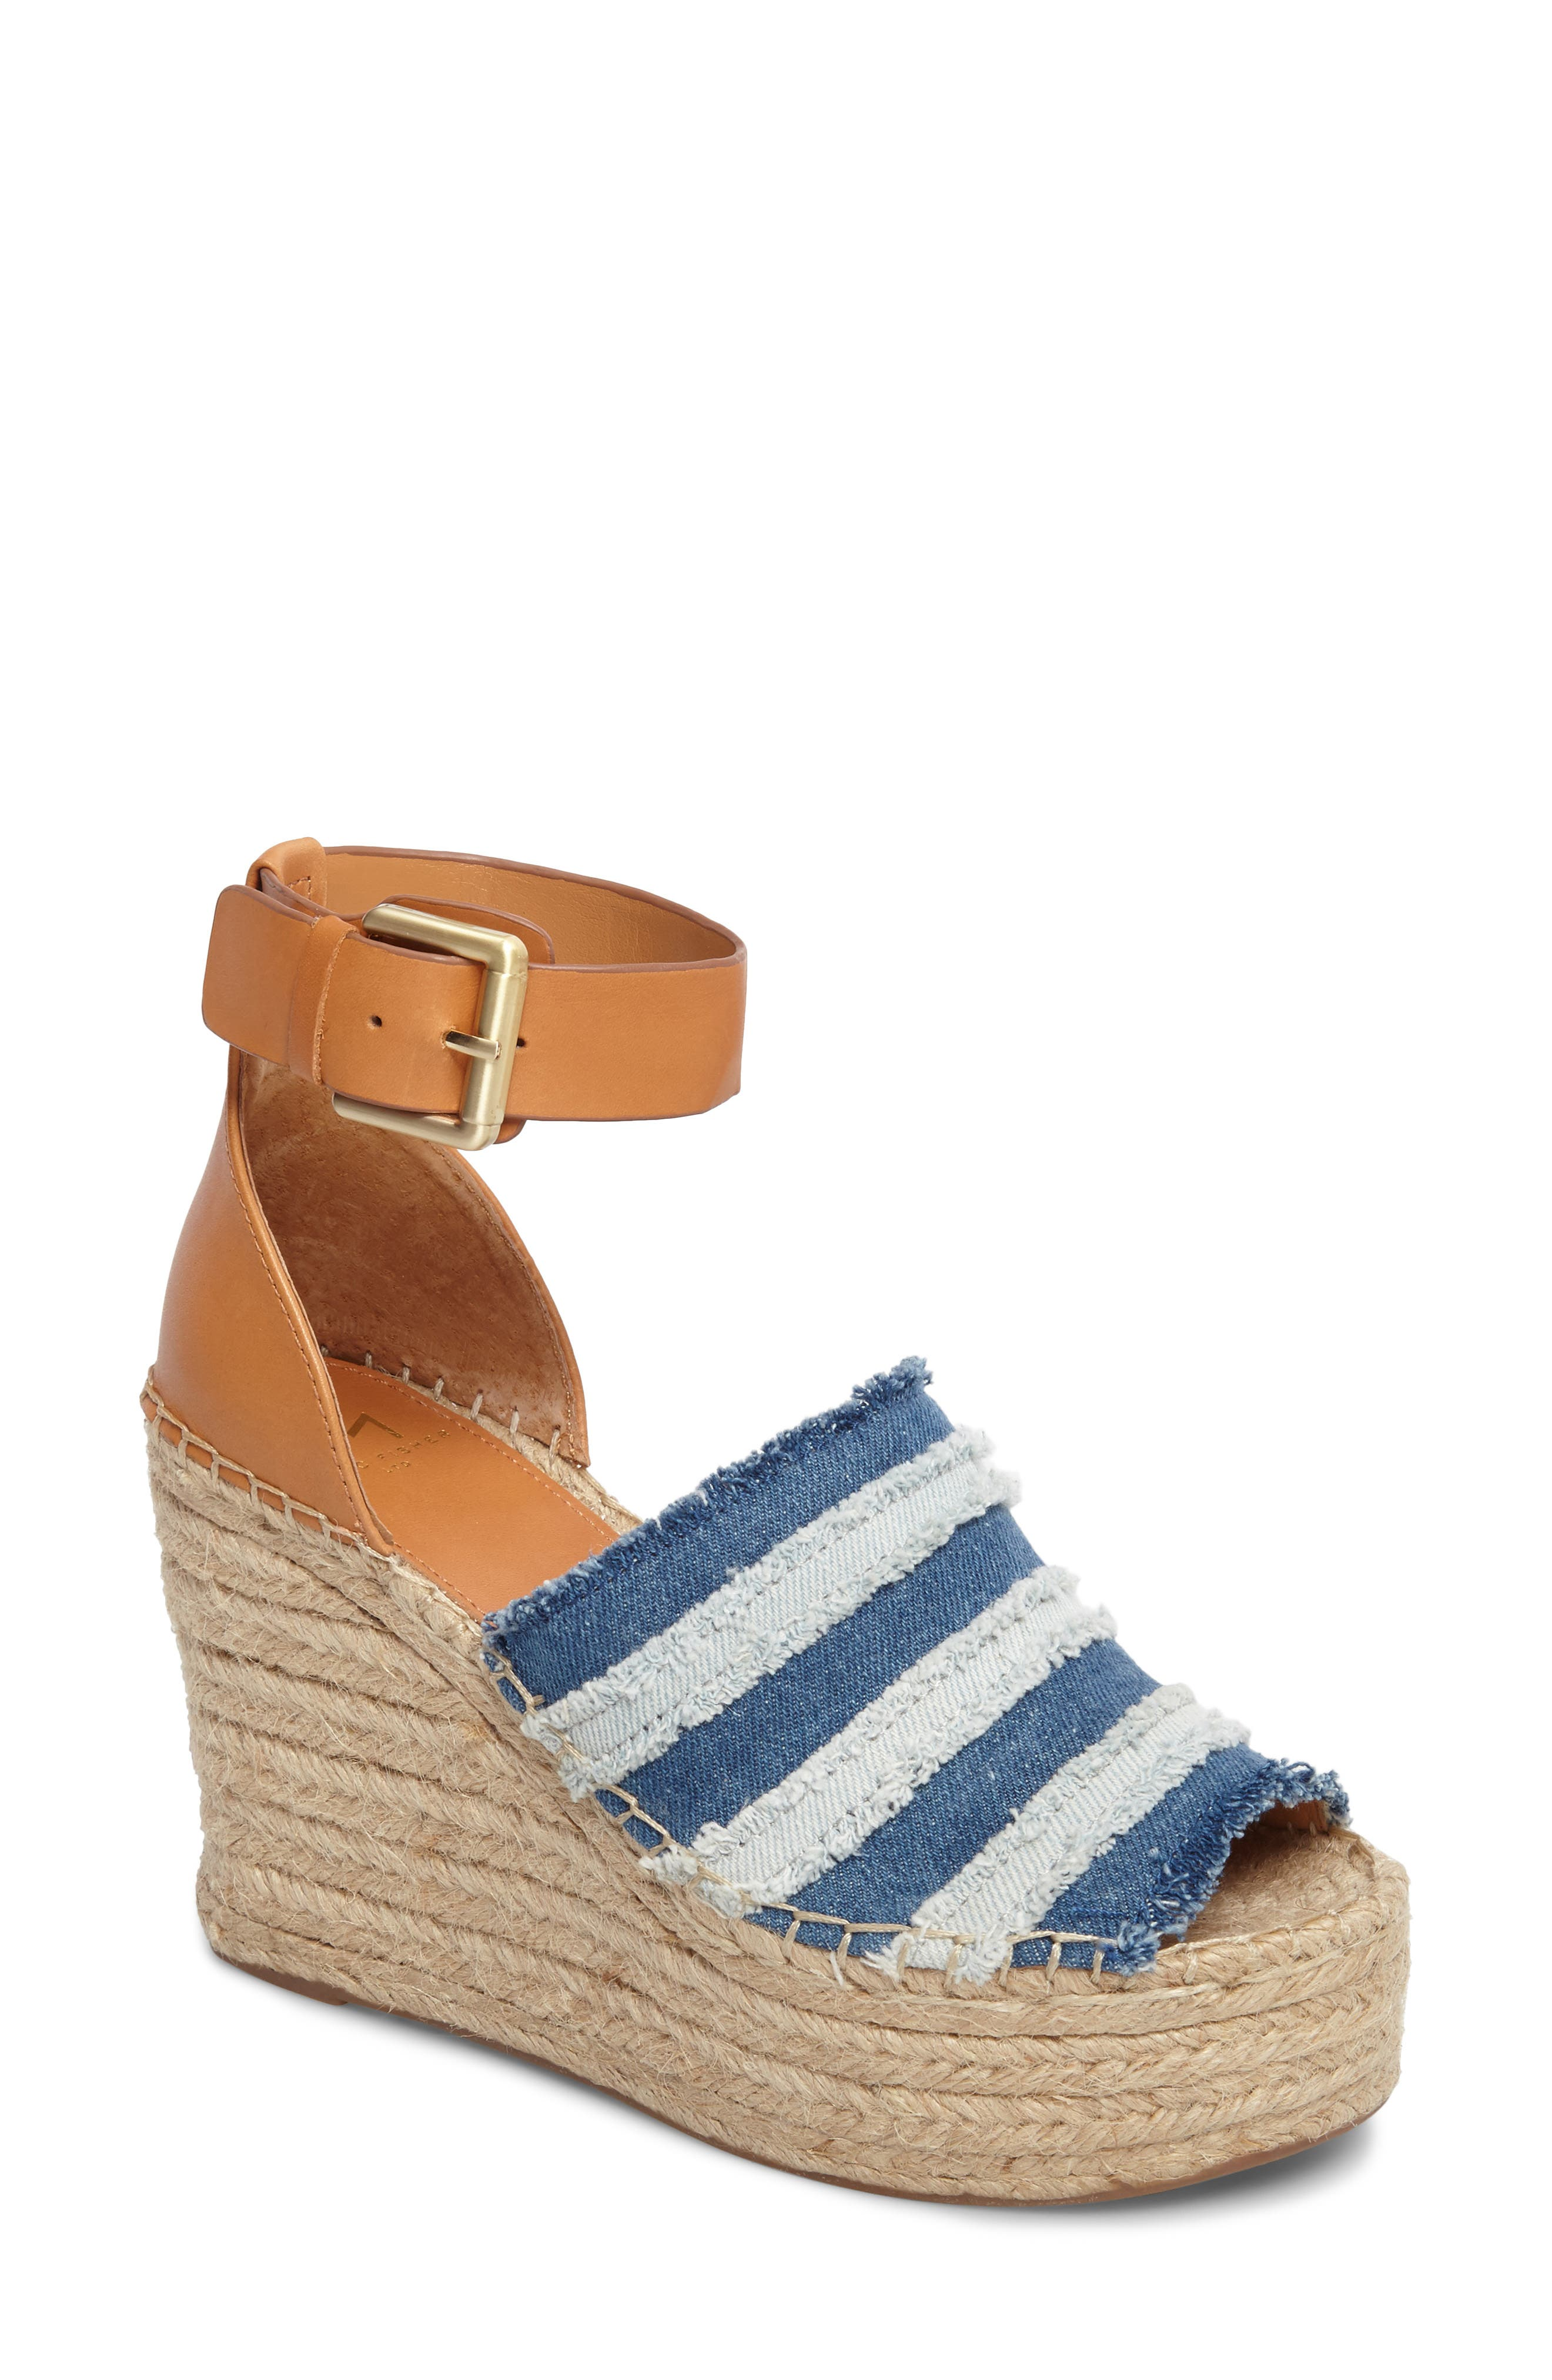 Adria Wedge Sandal,                         Main,                         color,